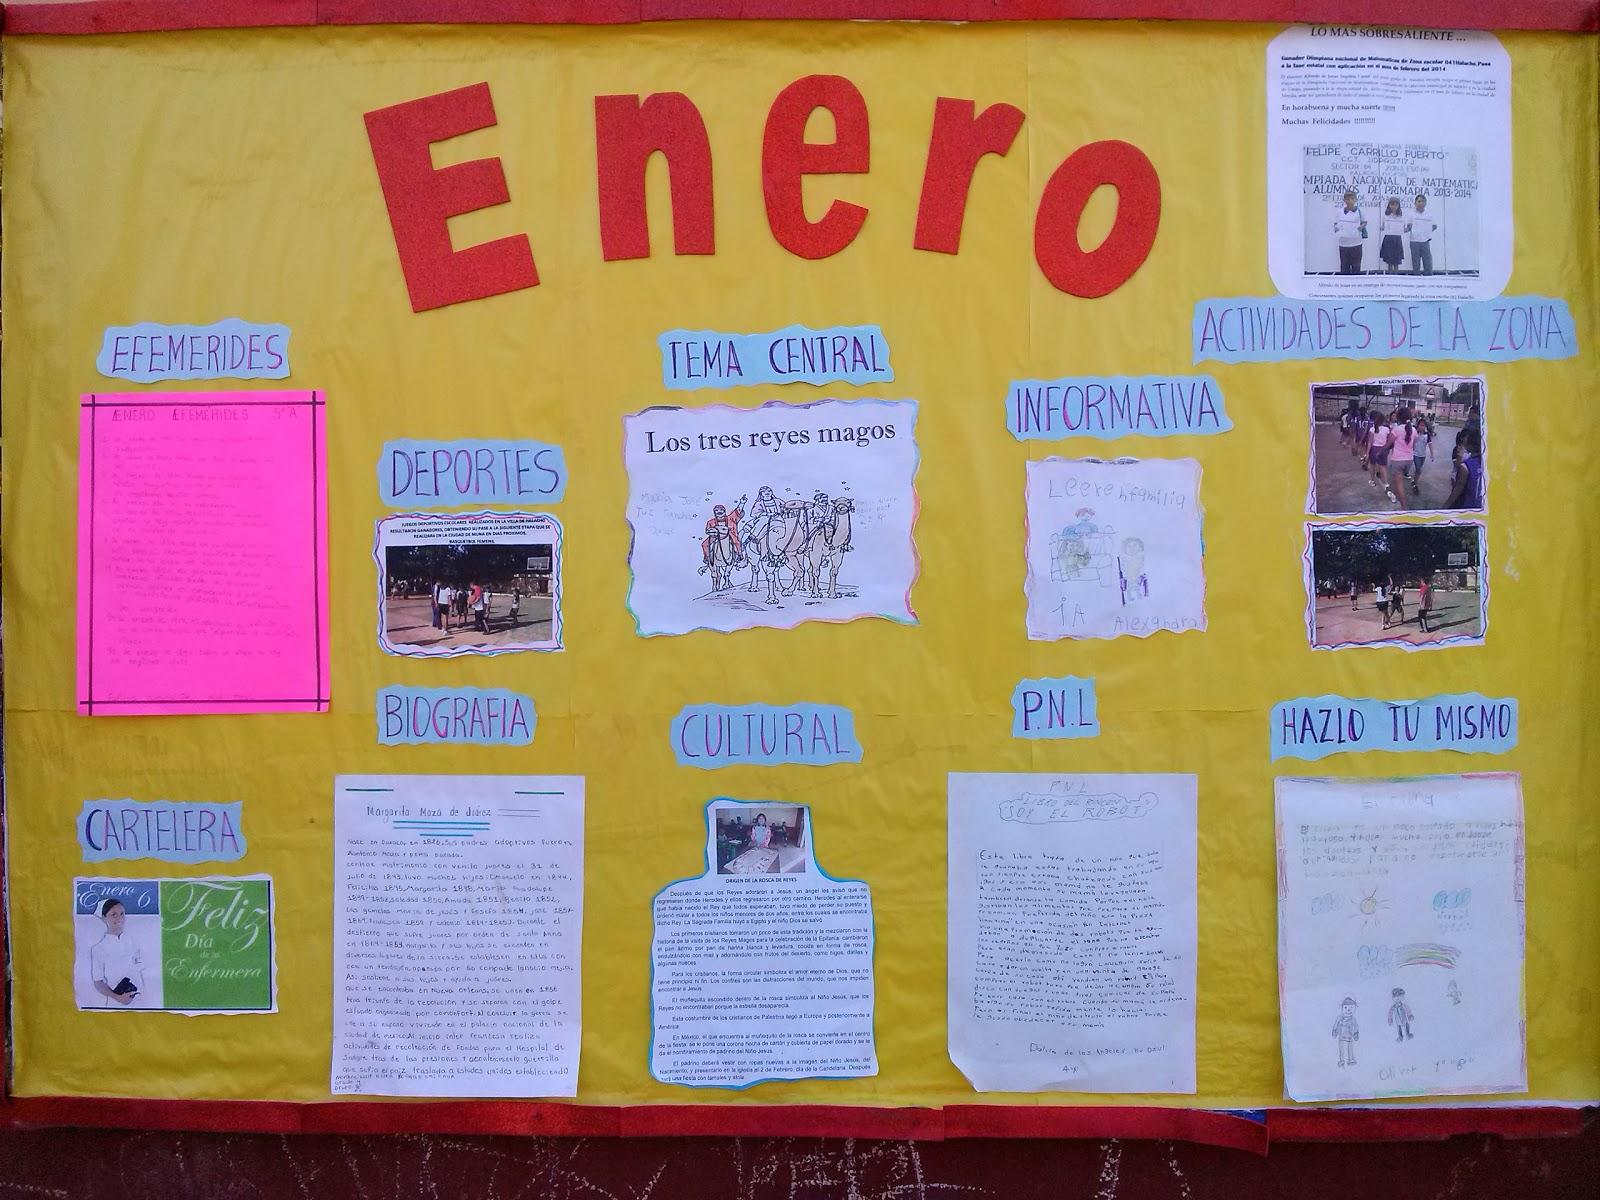 Periodico mura enero 1 imagenes educativas for Estructura del periodico mural